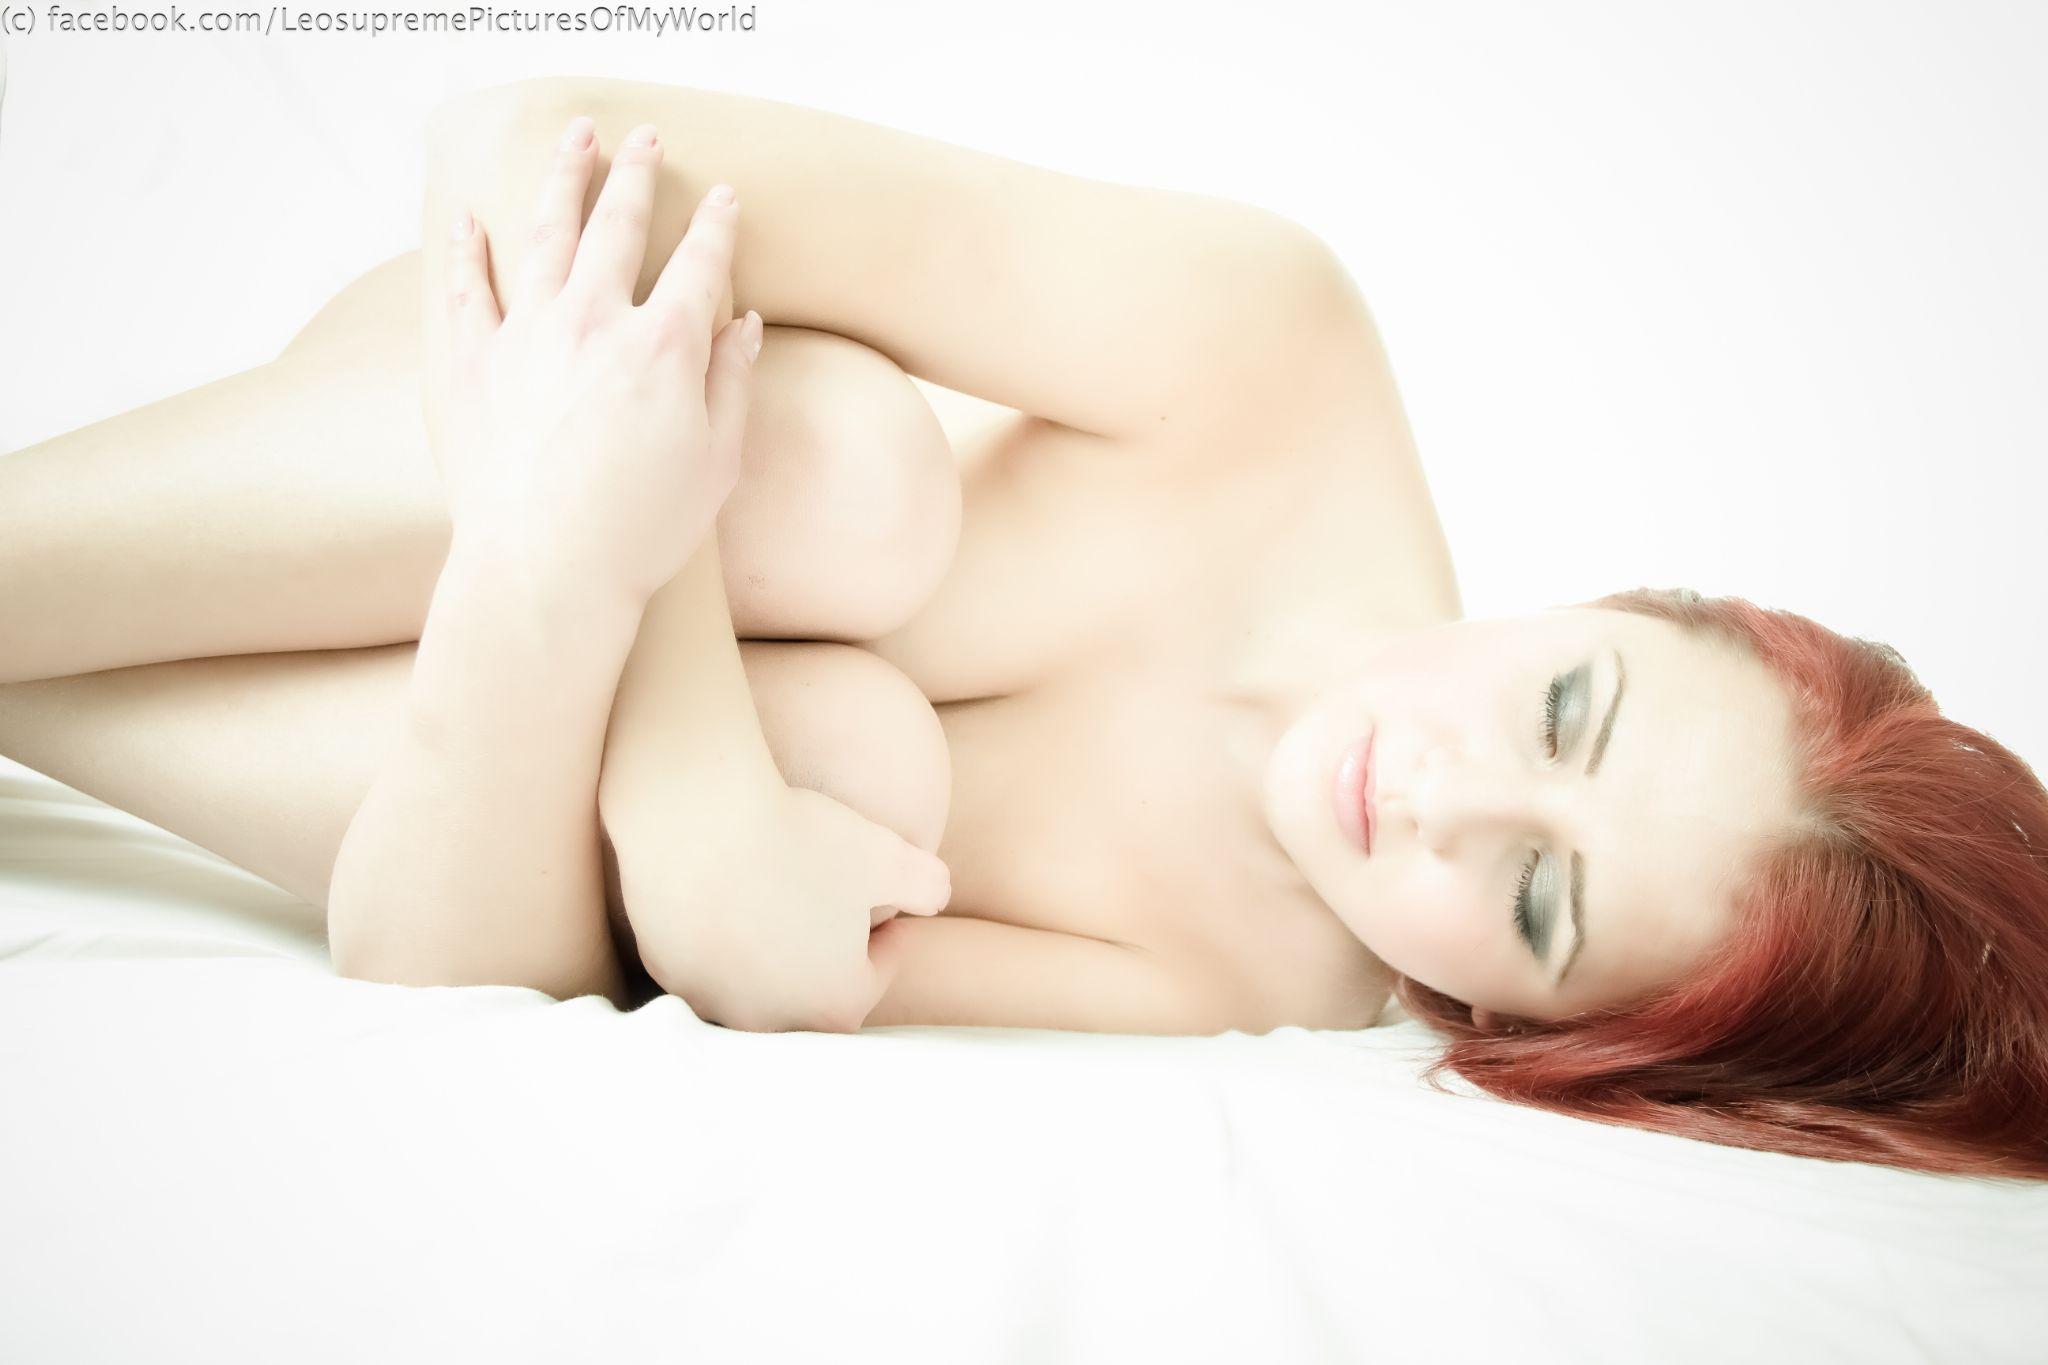 Dream by Leosupreme-Photography